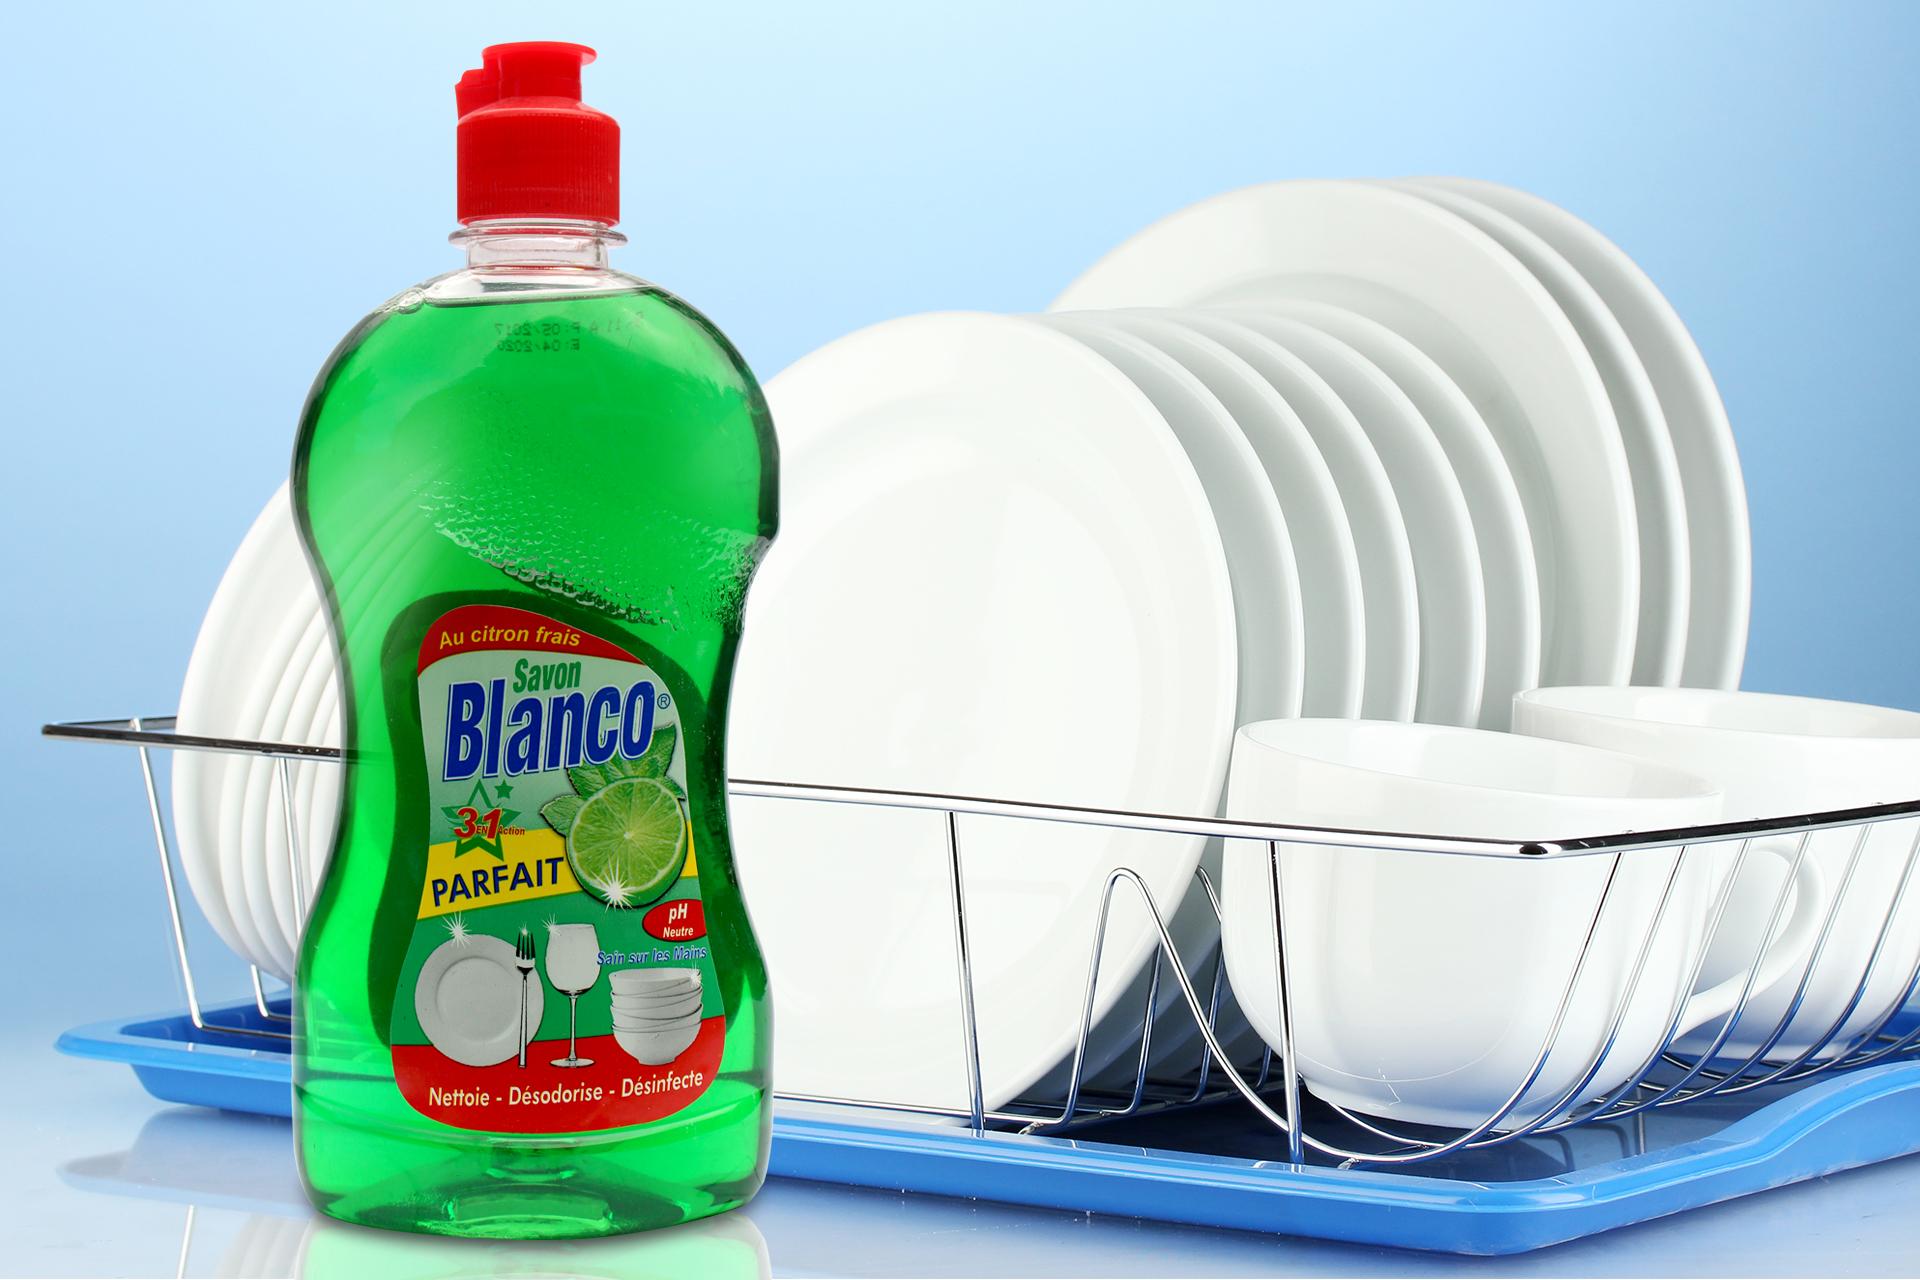 https://www.orbitsarl.com/wp-content/uploads/2017/08/Product-Cleaning_Blanco-Dishwash-Liquid_1920x1280-FIN.jpg